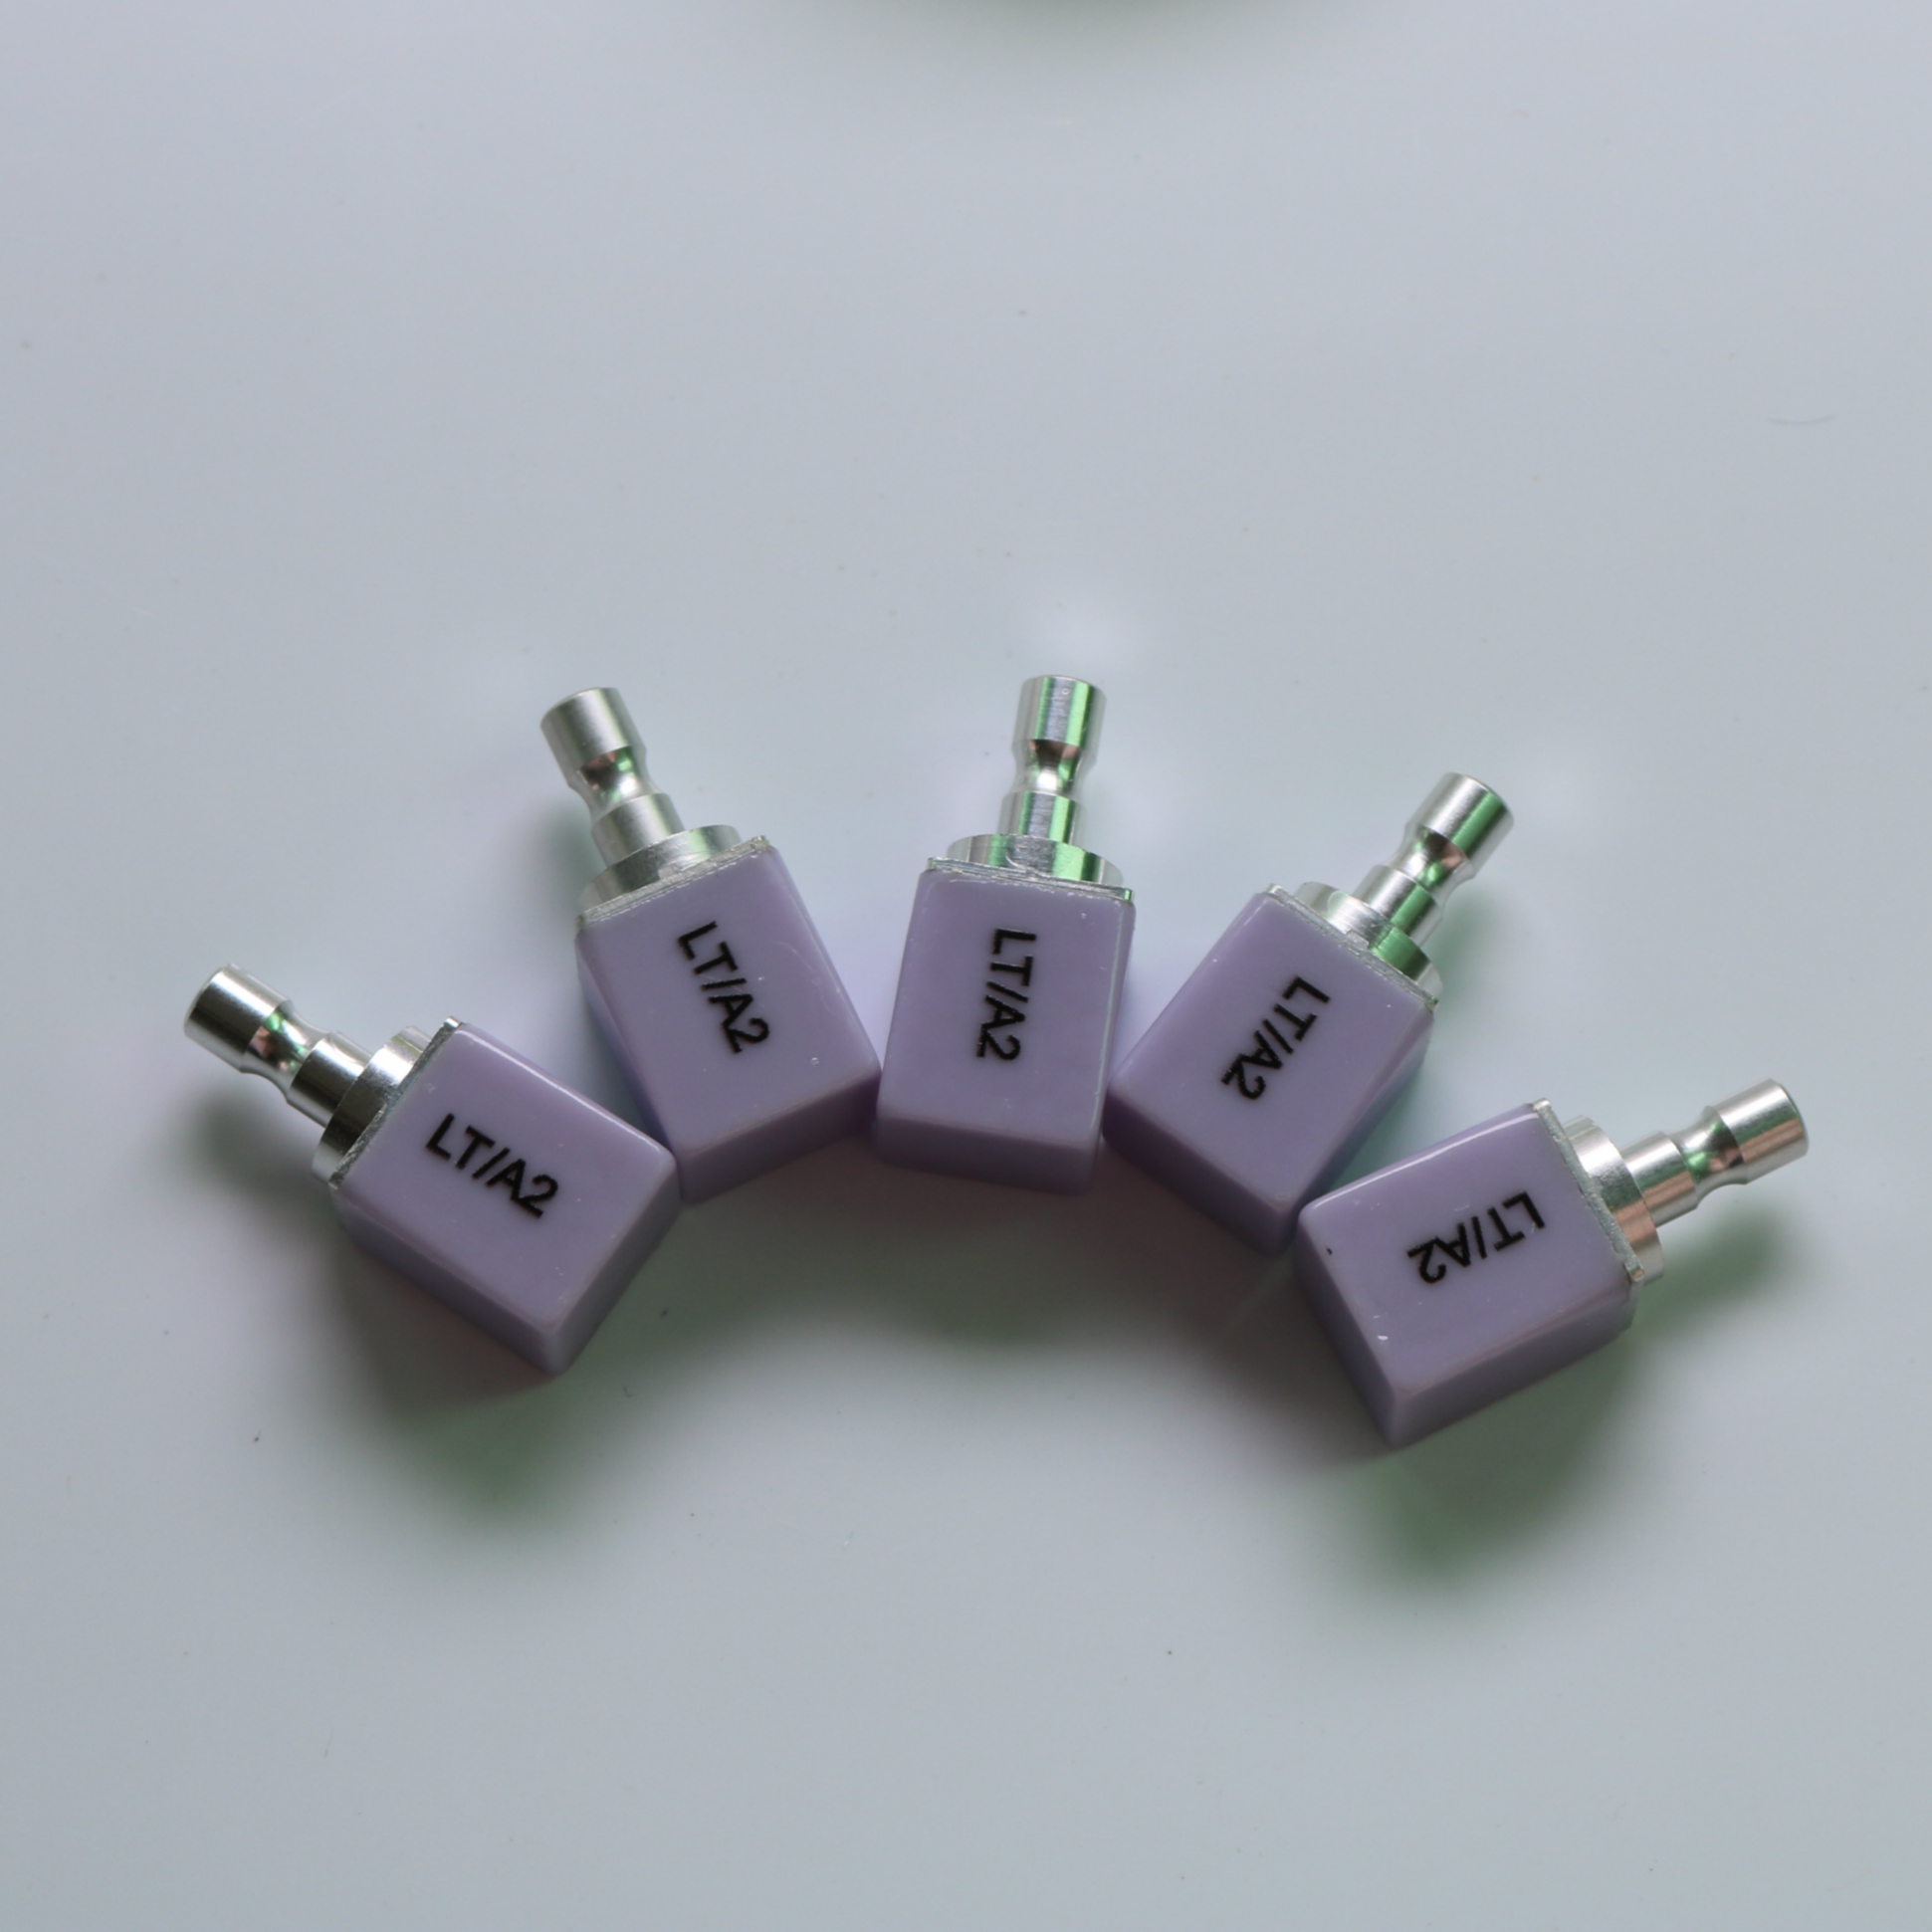 5pcs/lot C14 LT HT Dental Lithium Dislicate Blocks Emax Cerec Glass Ceramic Blocks CAD CAM For Sales